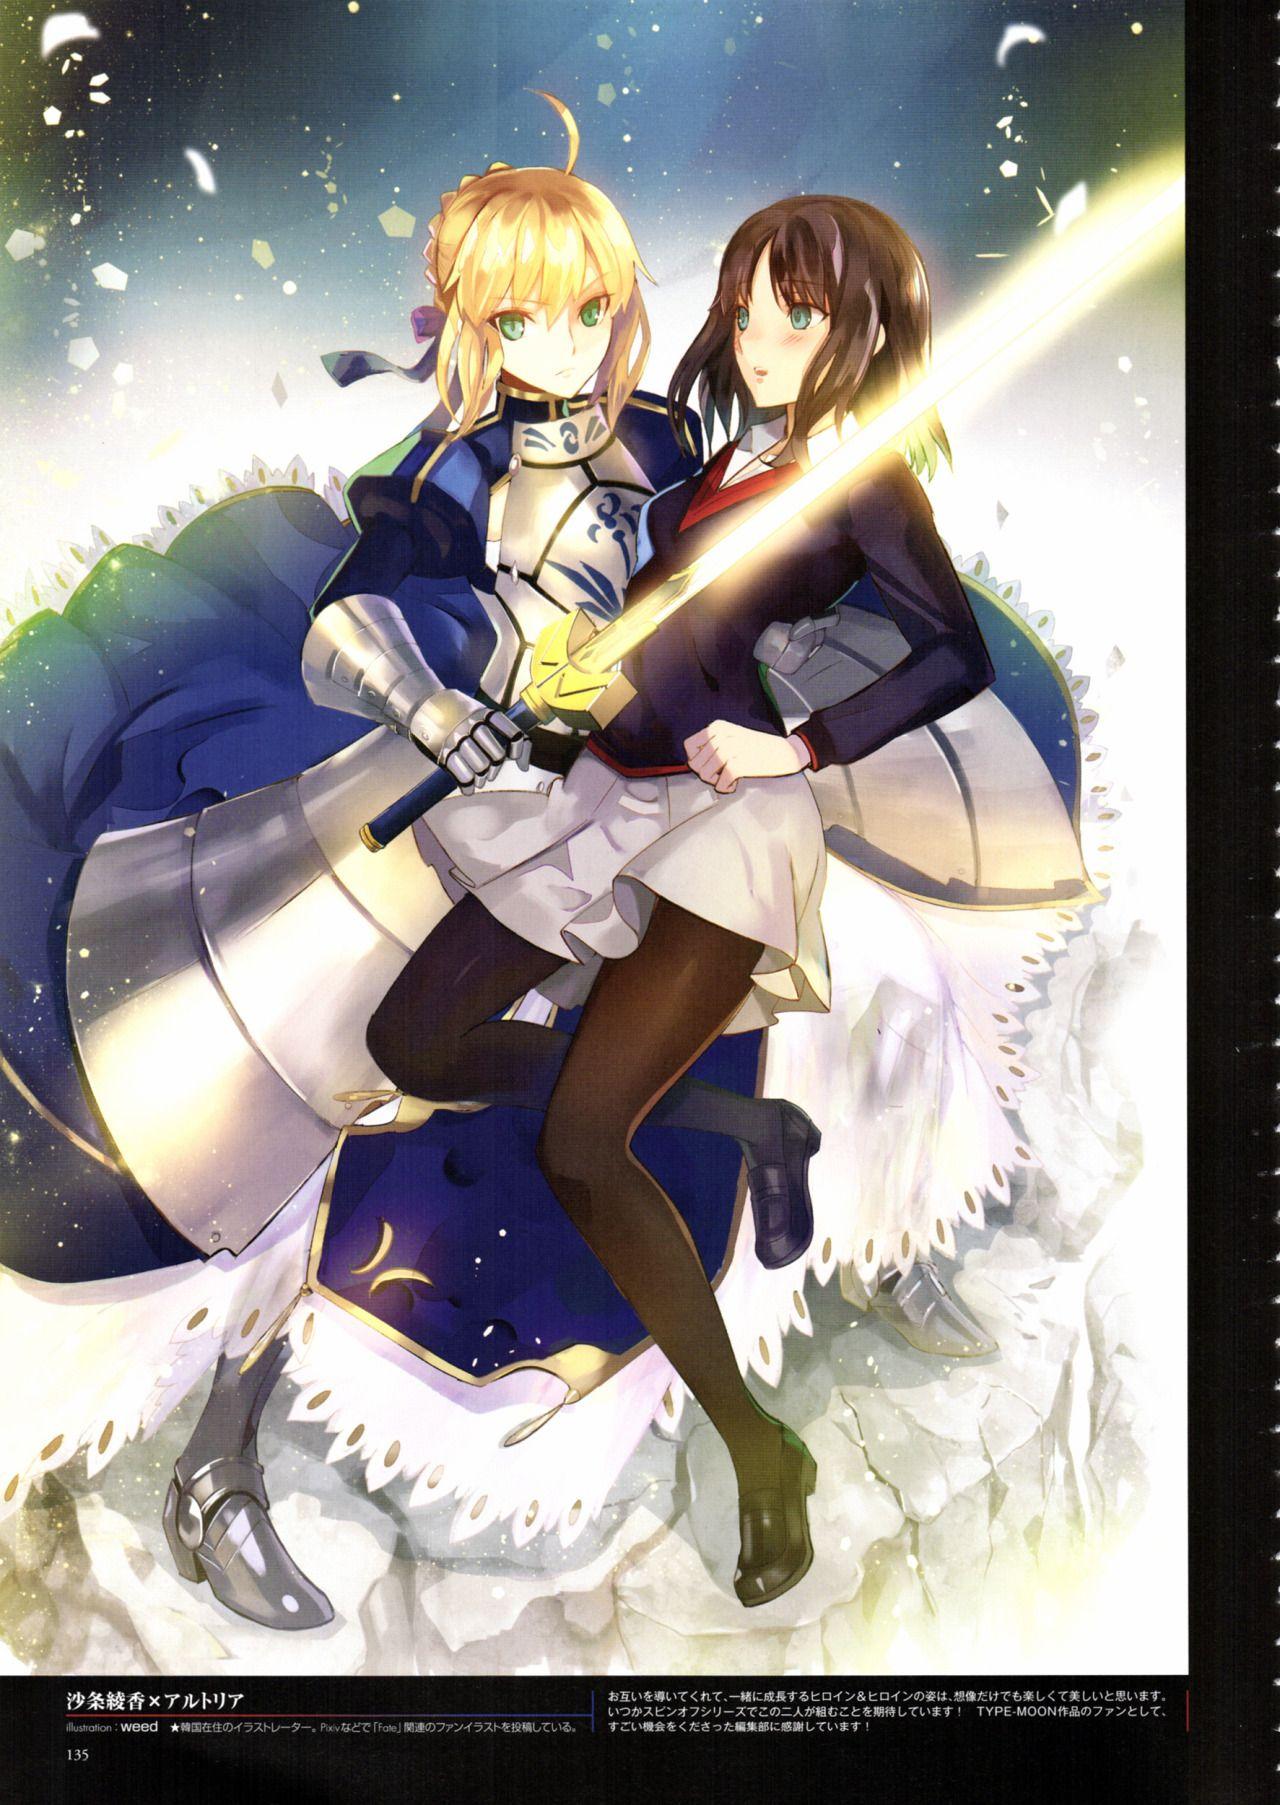 Ayaka Sajyou / Saber【Fate】 Fate anime series, Fate stay